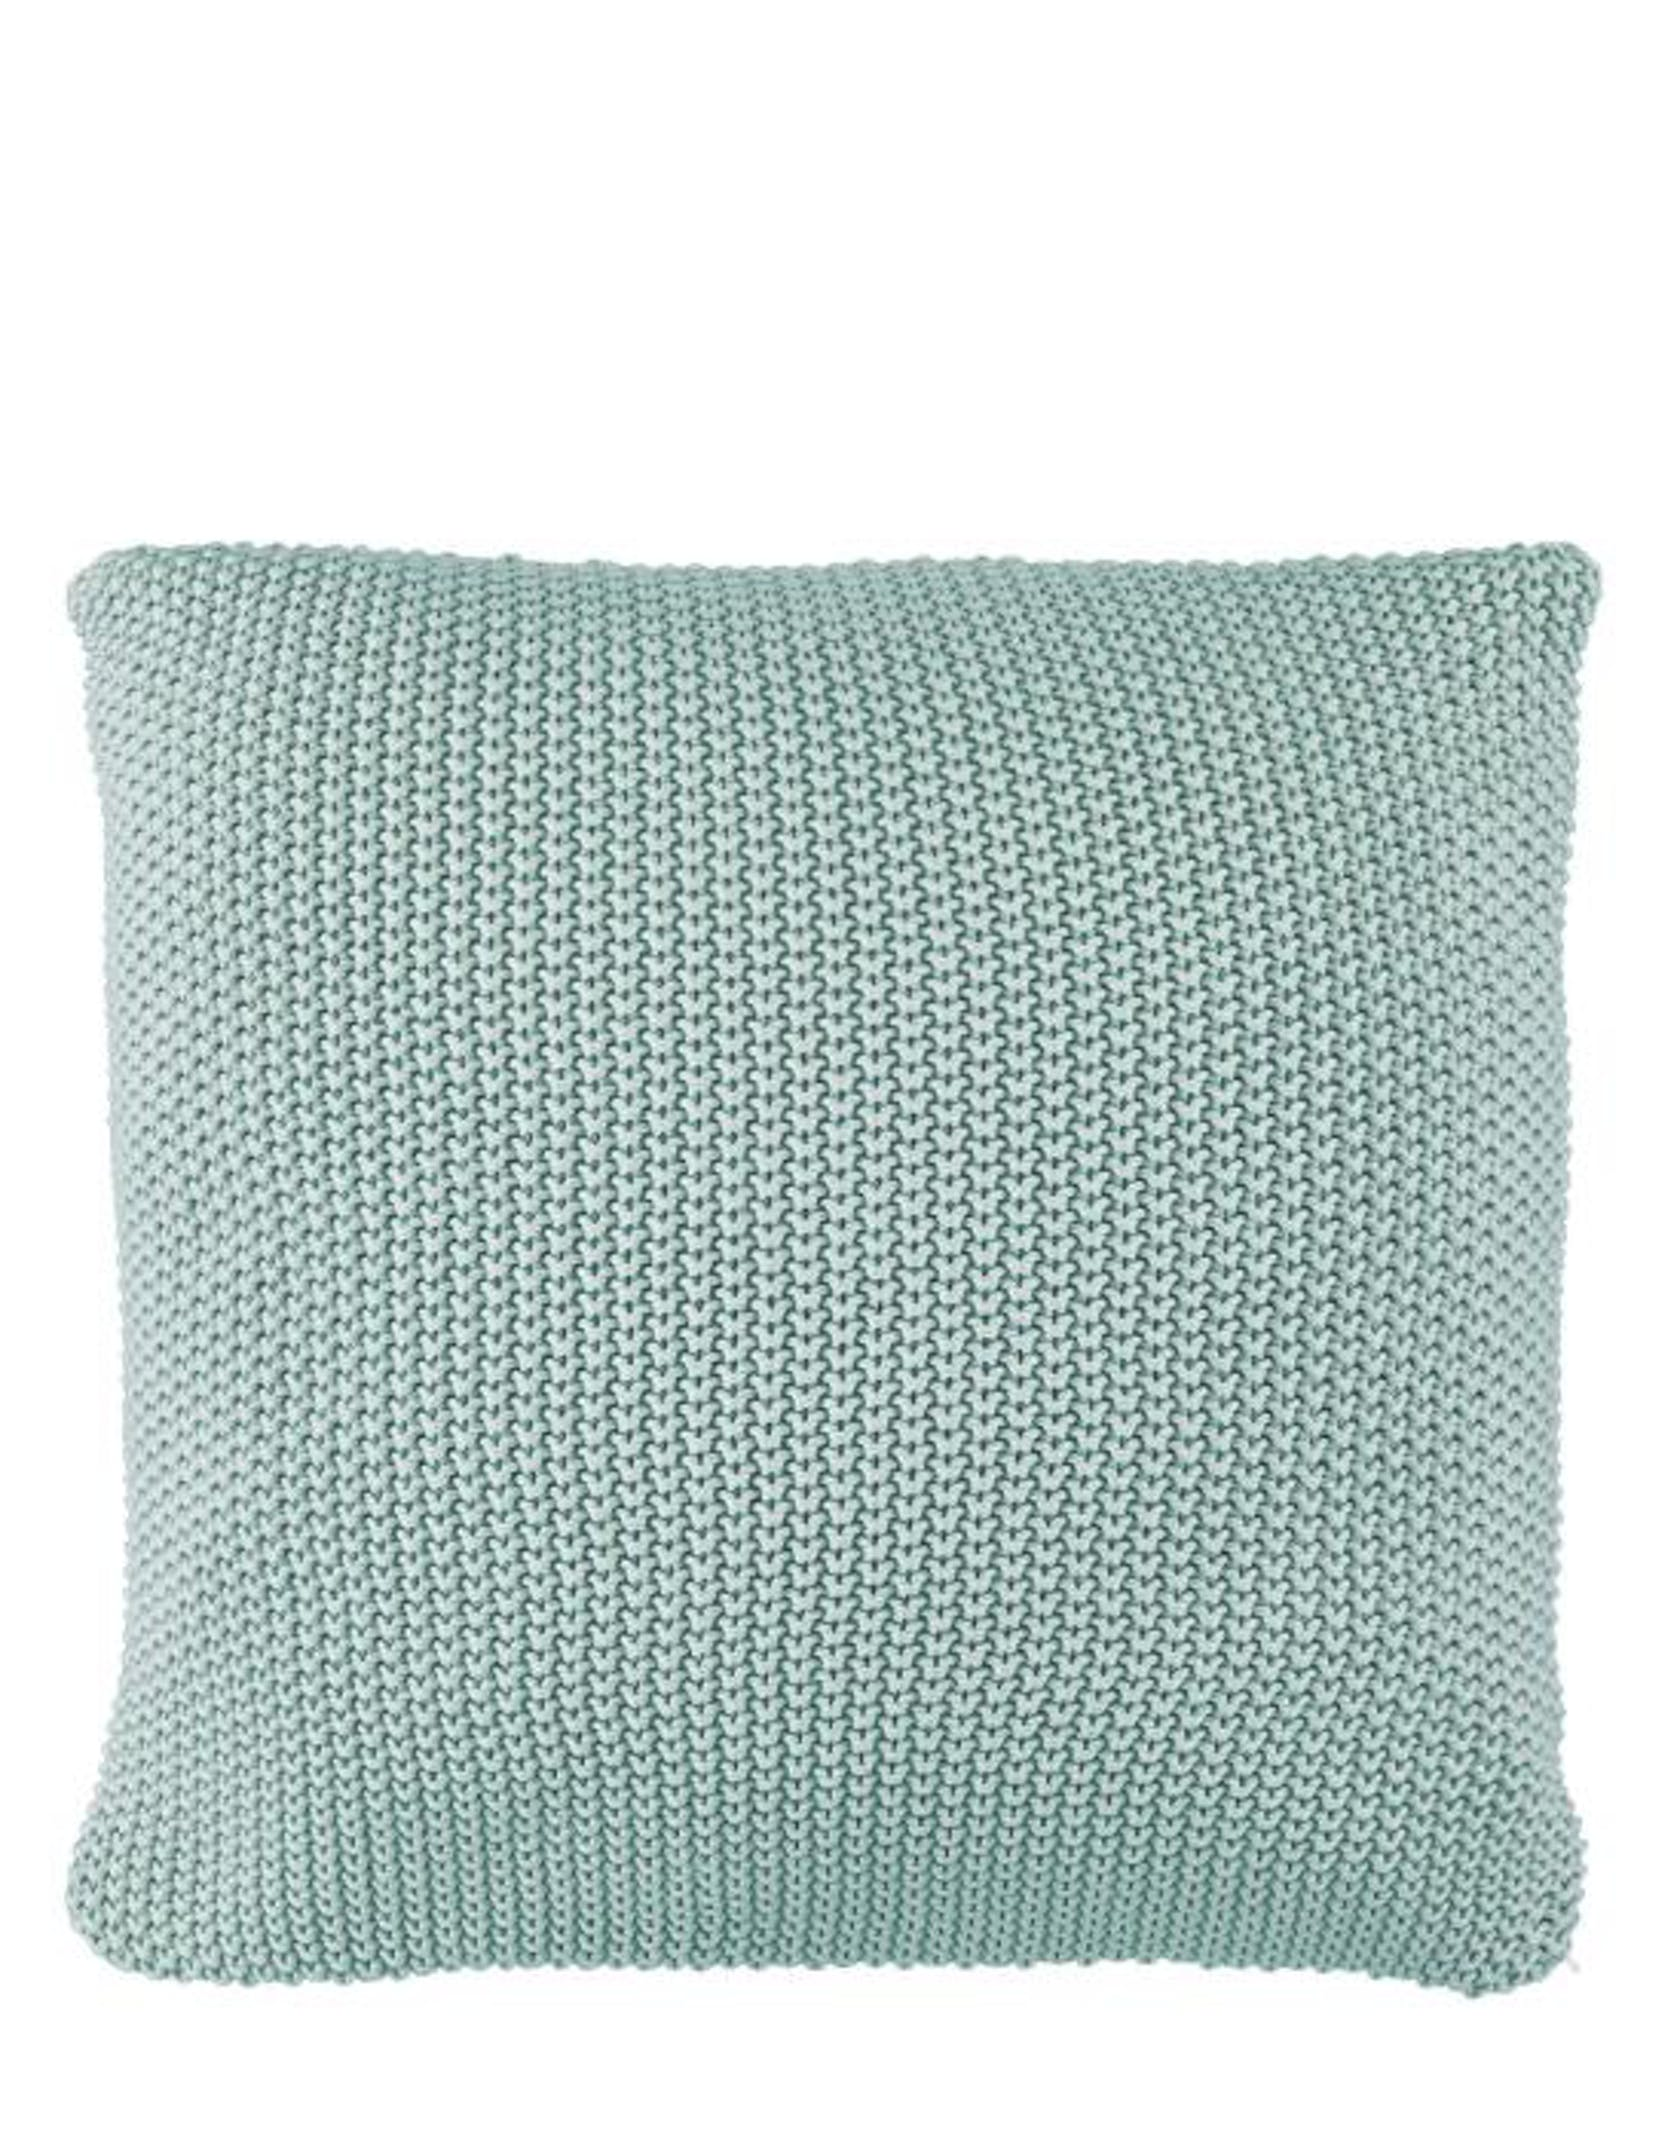 Marc O'Polo Nordic knit  Cushion square Soft green